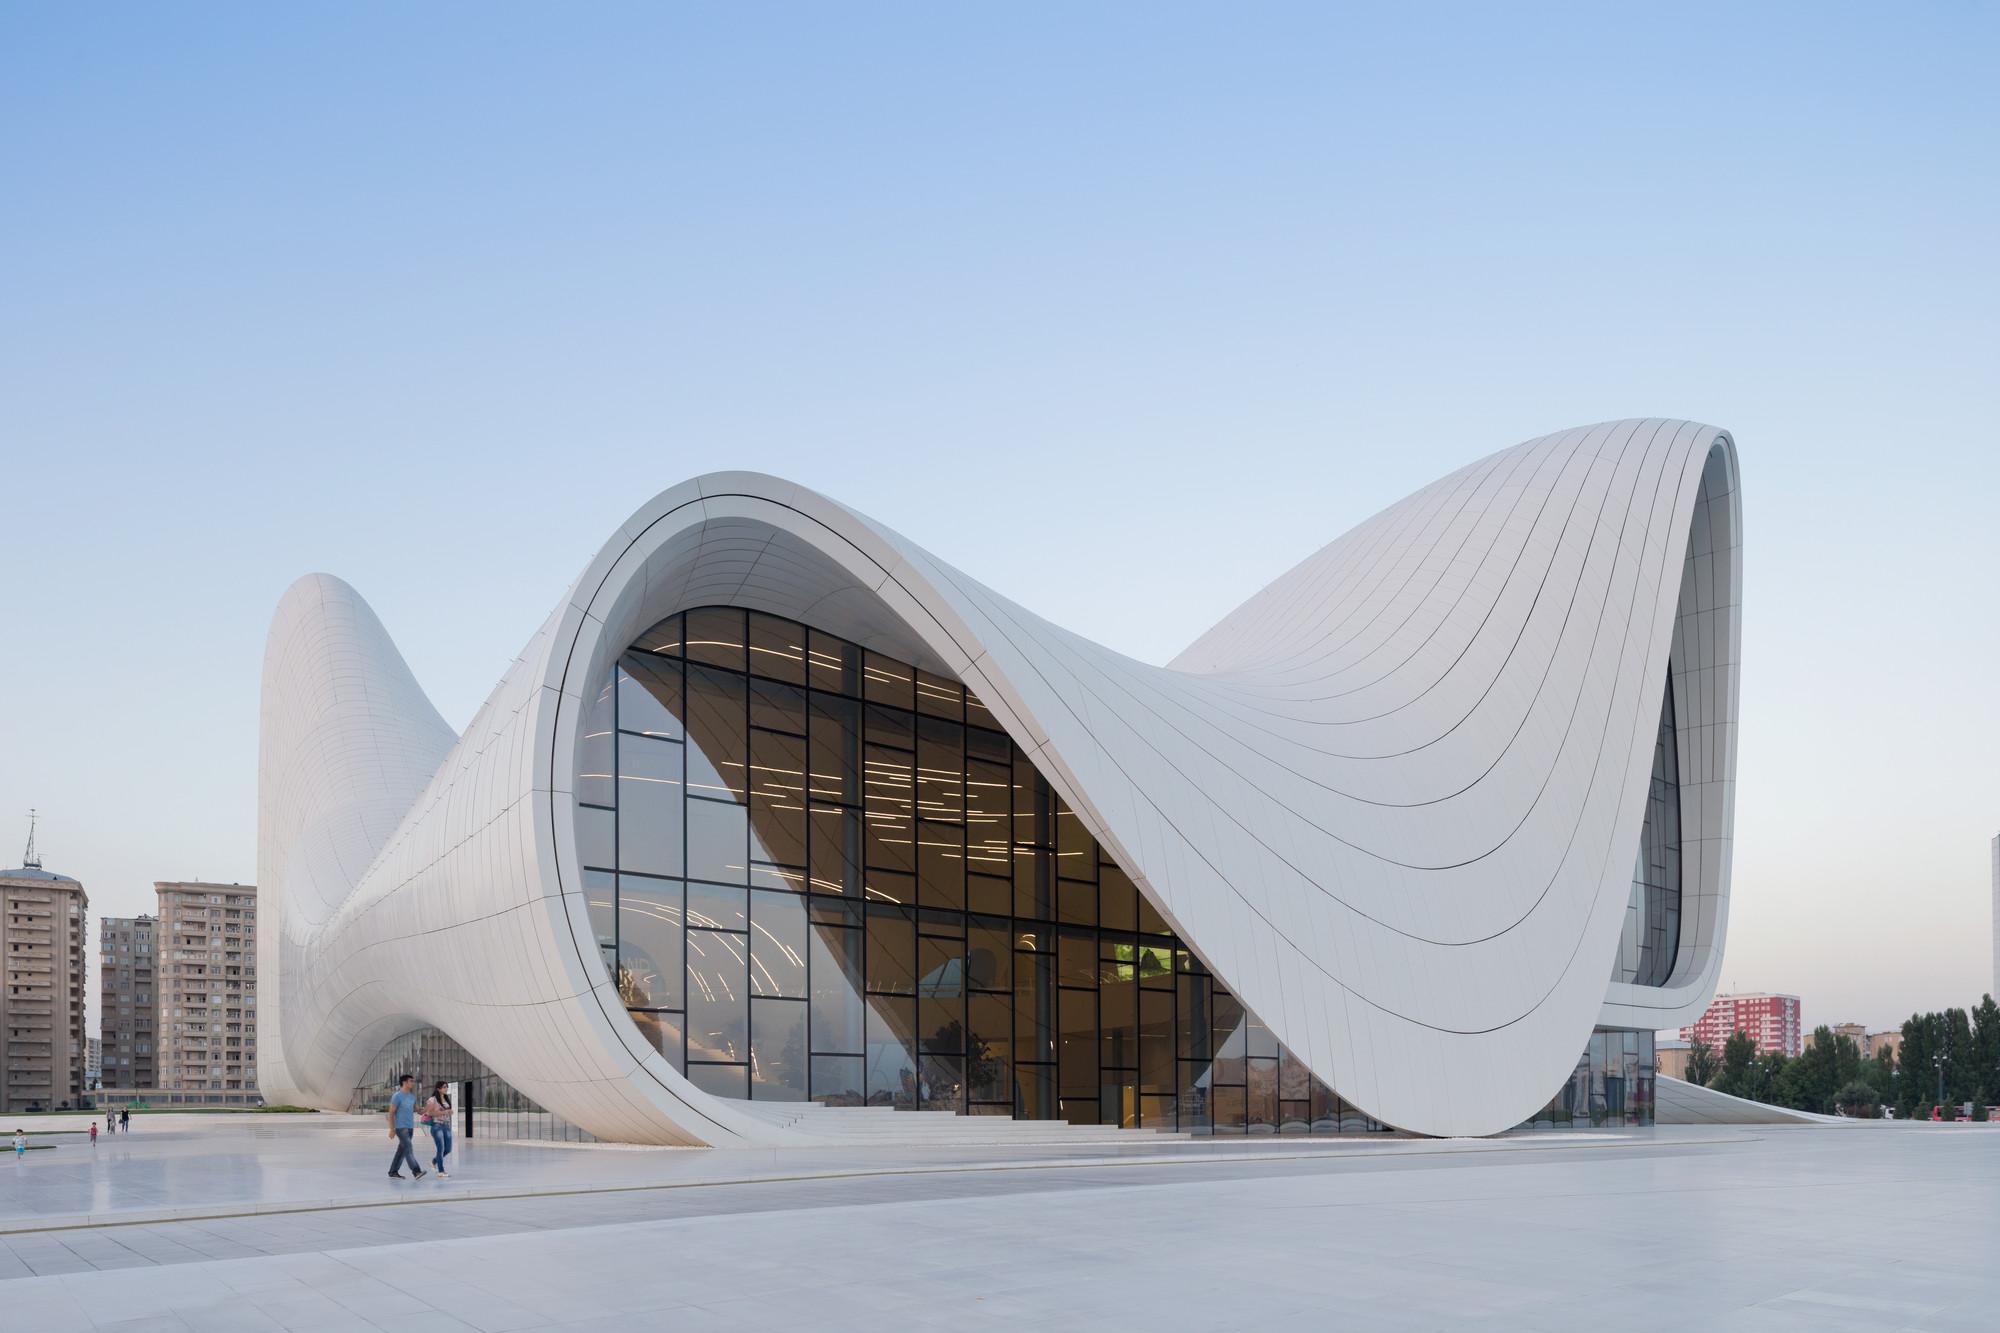 Heydar aliyev center zaha hadid architects archdaily for Architecture zaha hadid